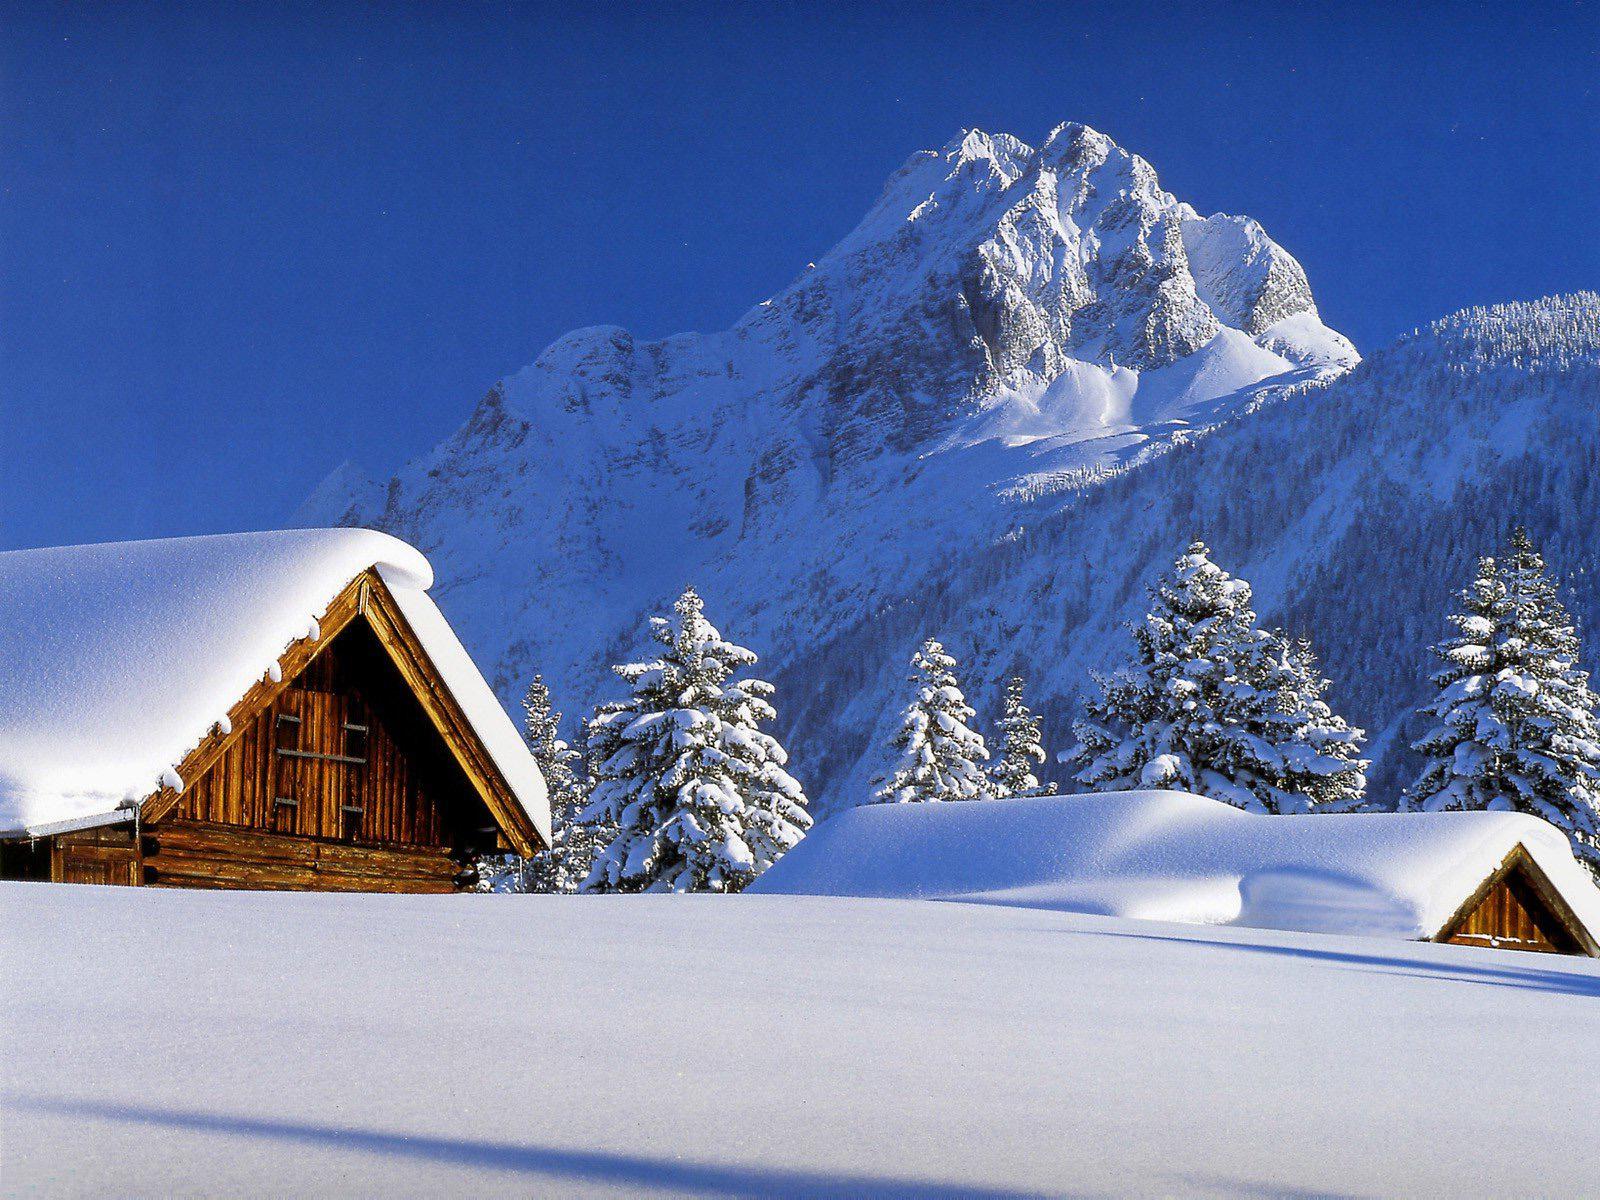 Snow Desktop Wallpapers   Full HD Wallpapers 2015